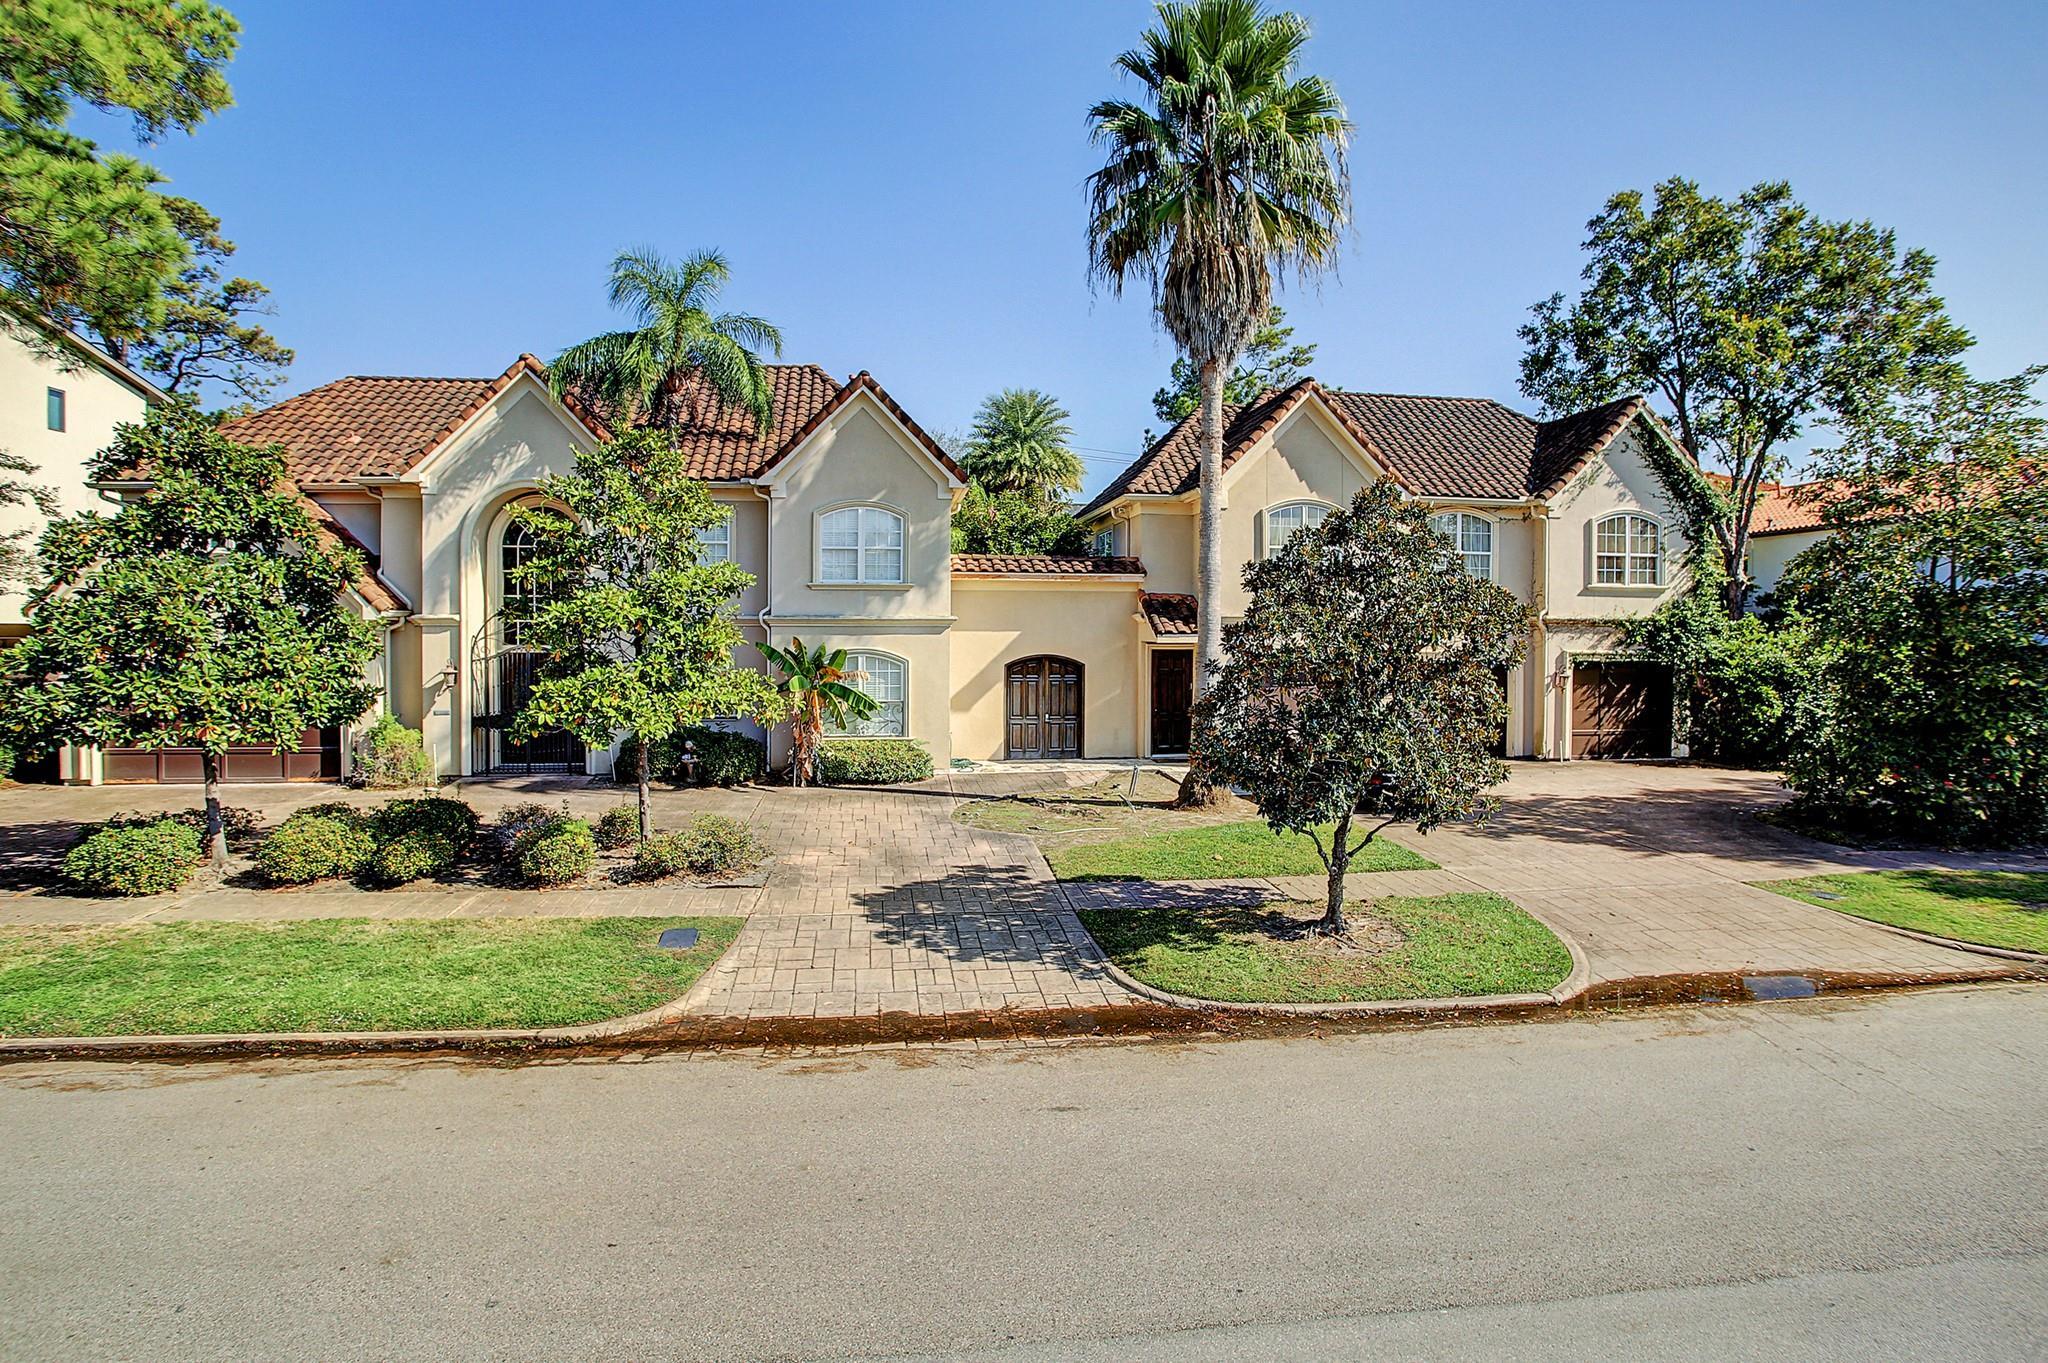 412 Crestwood Property Photo - Houston, TX real estate listing